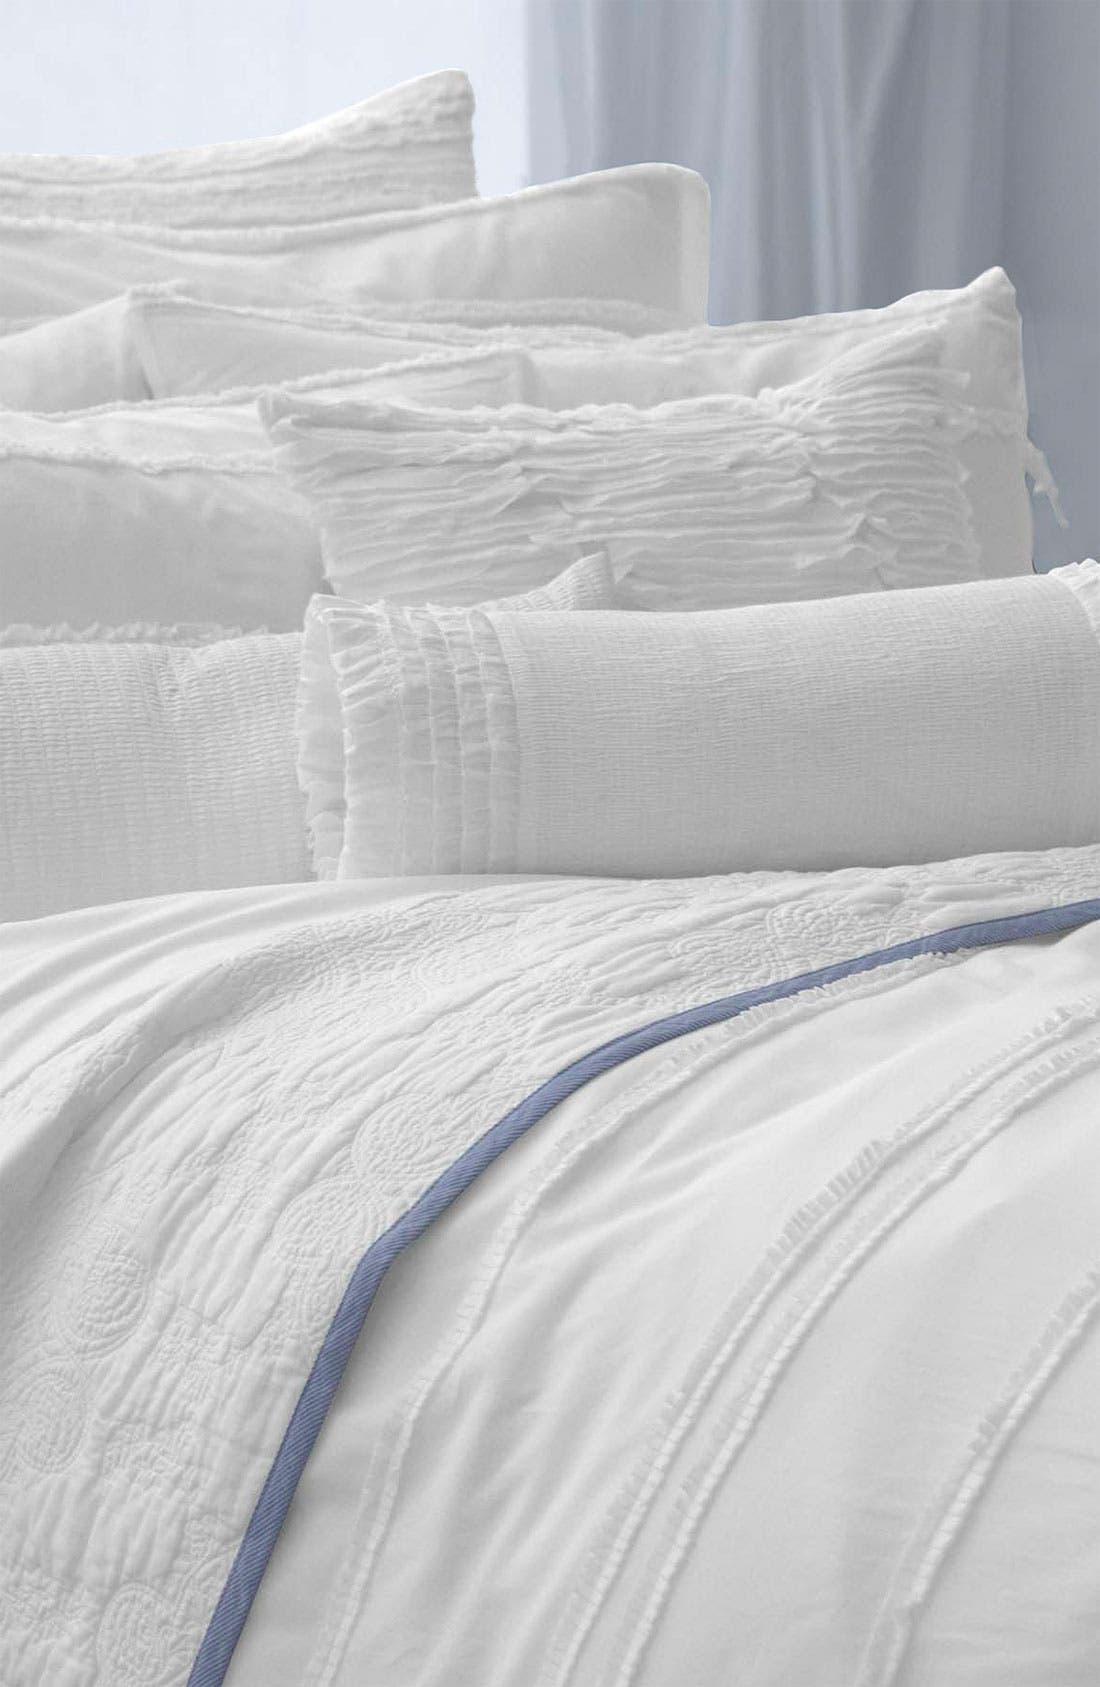 Main Image - DKNY 'Pure Innocence' Quilt